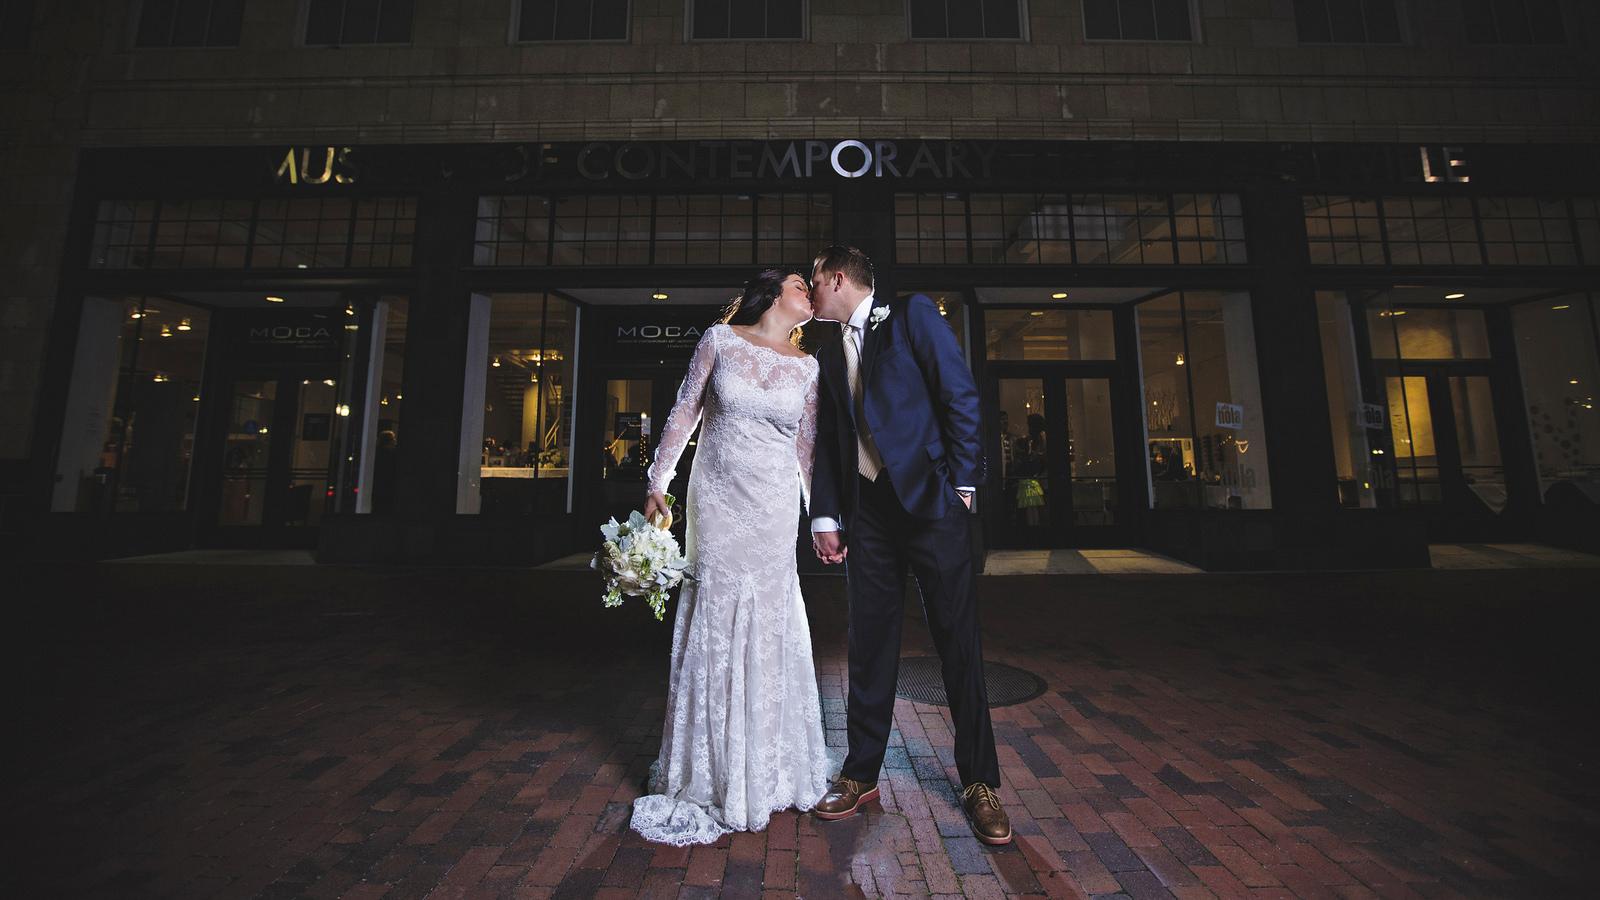 adam-szarmack-moca-wedding-jacksonville-46.jpg